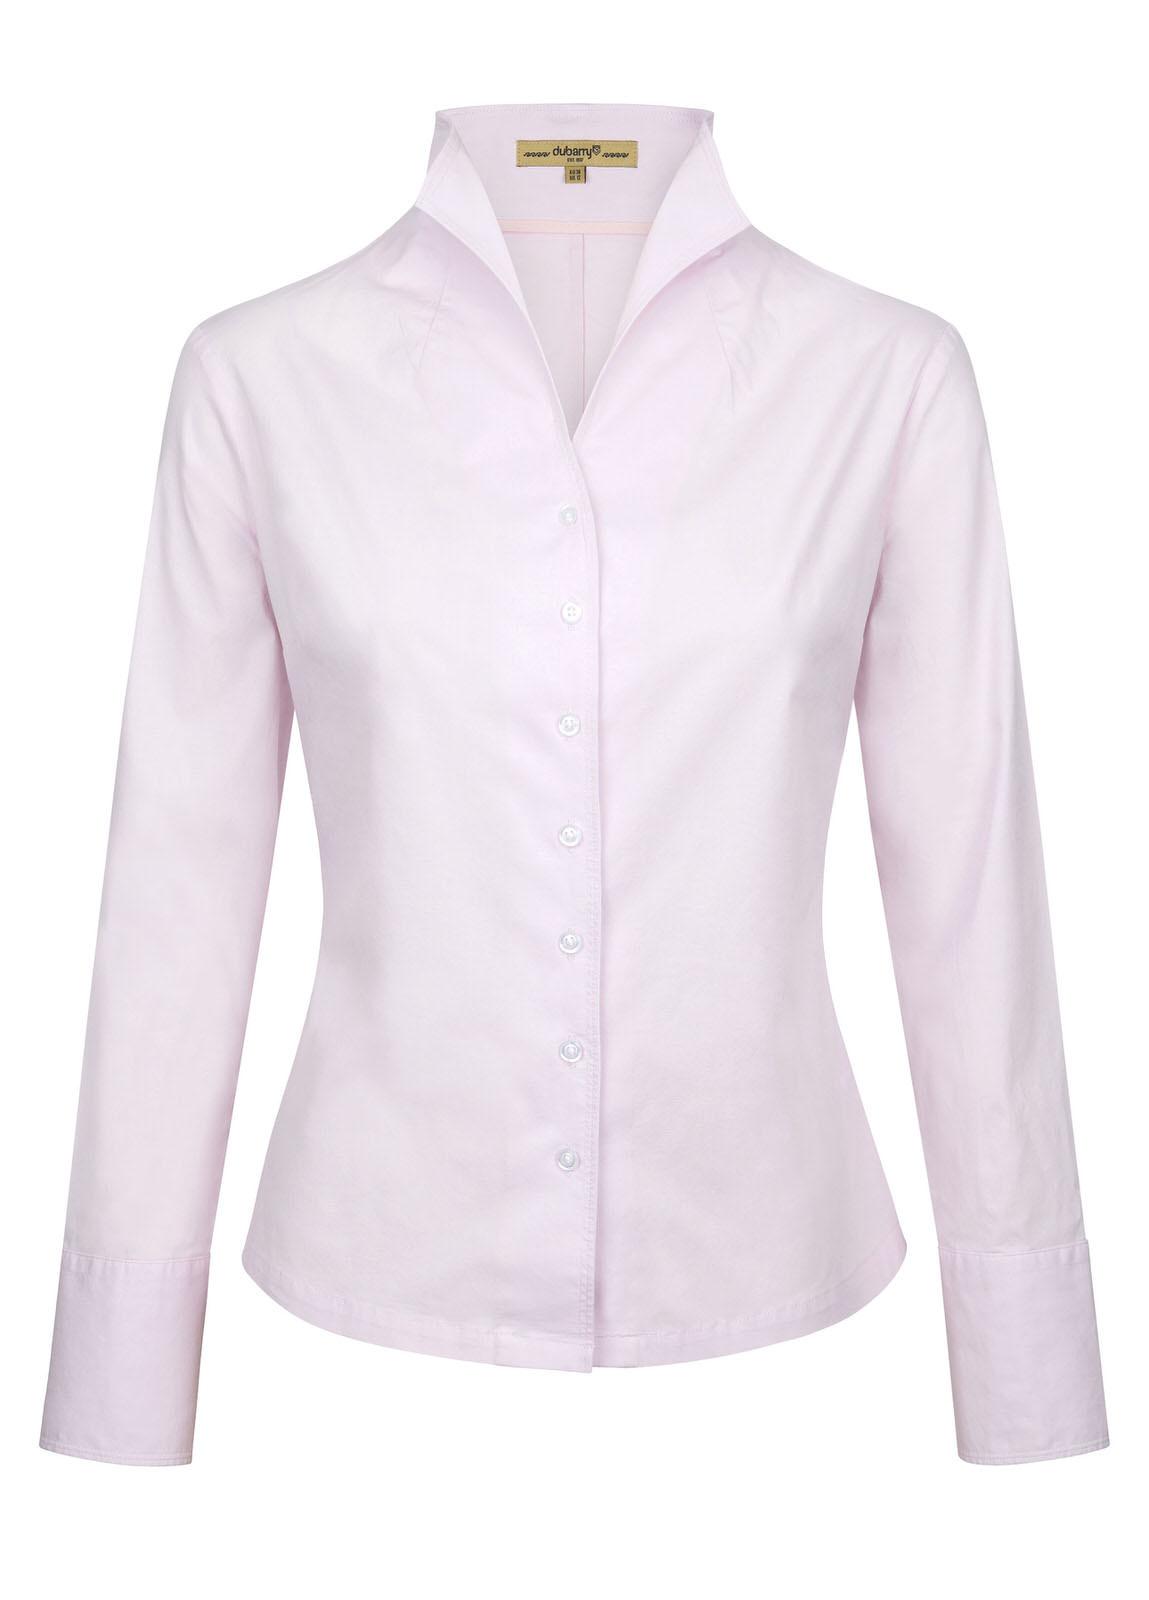 Snowdrop_Shirt_Pale_Pink_Image_1